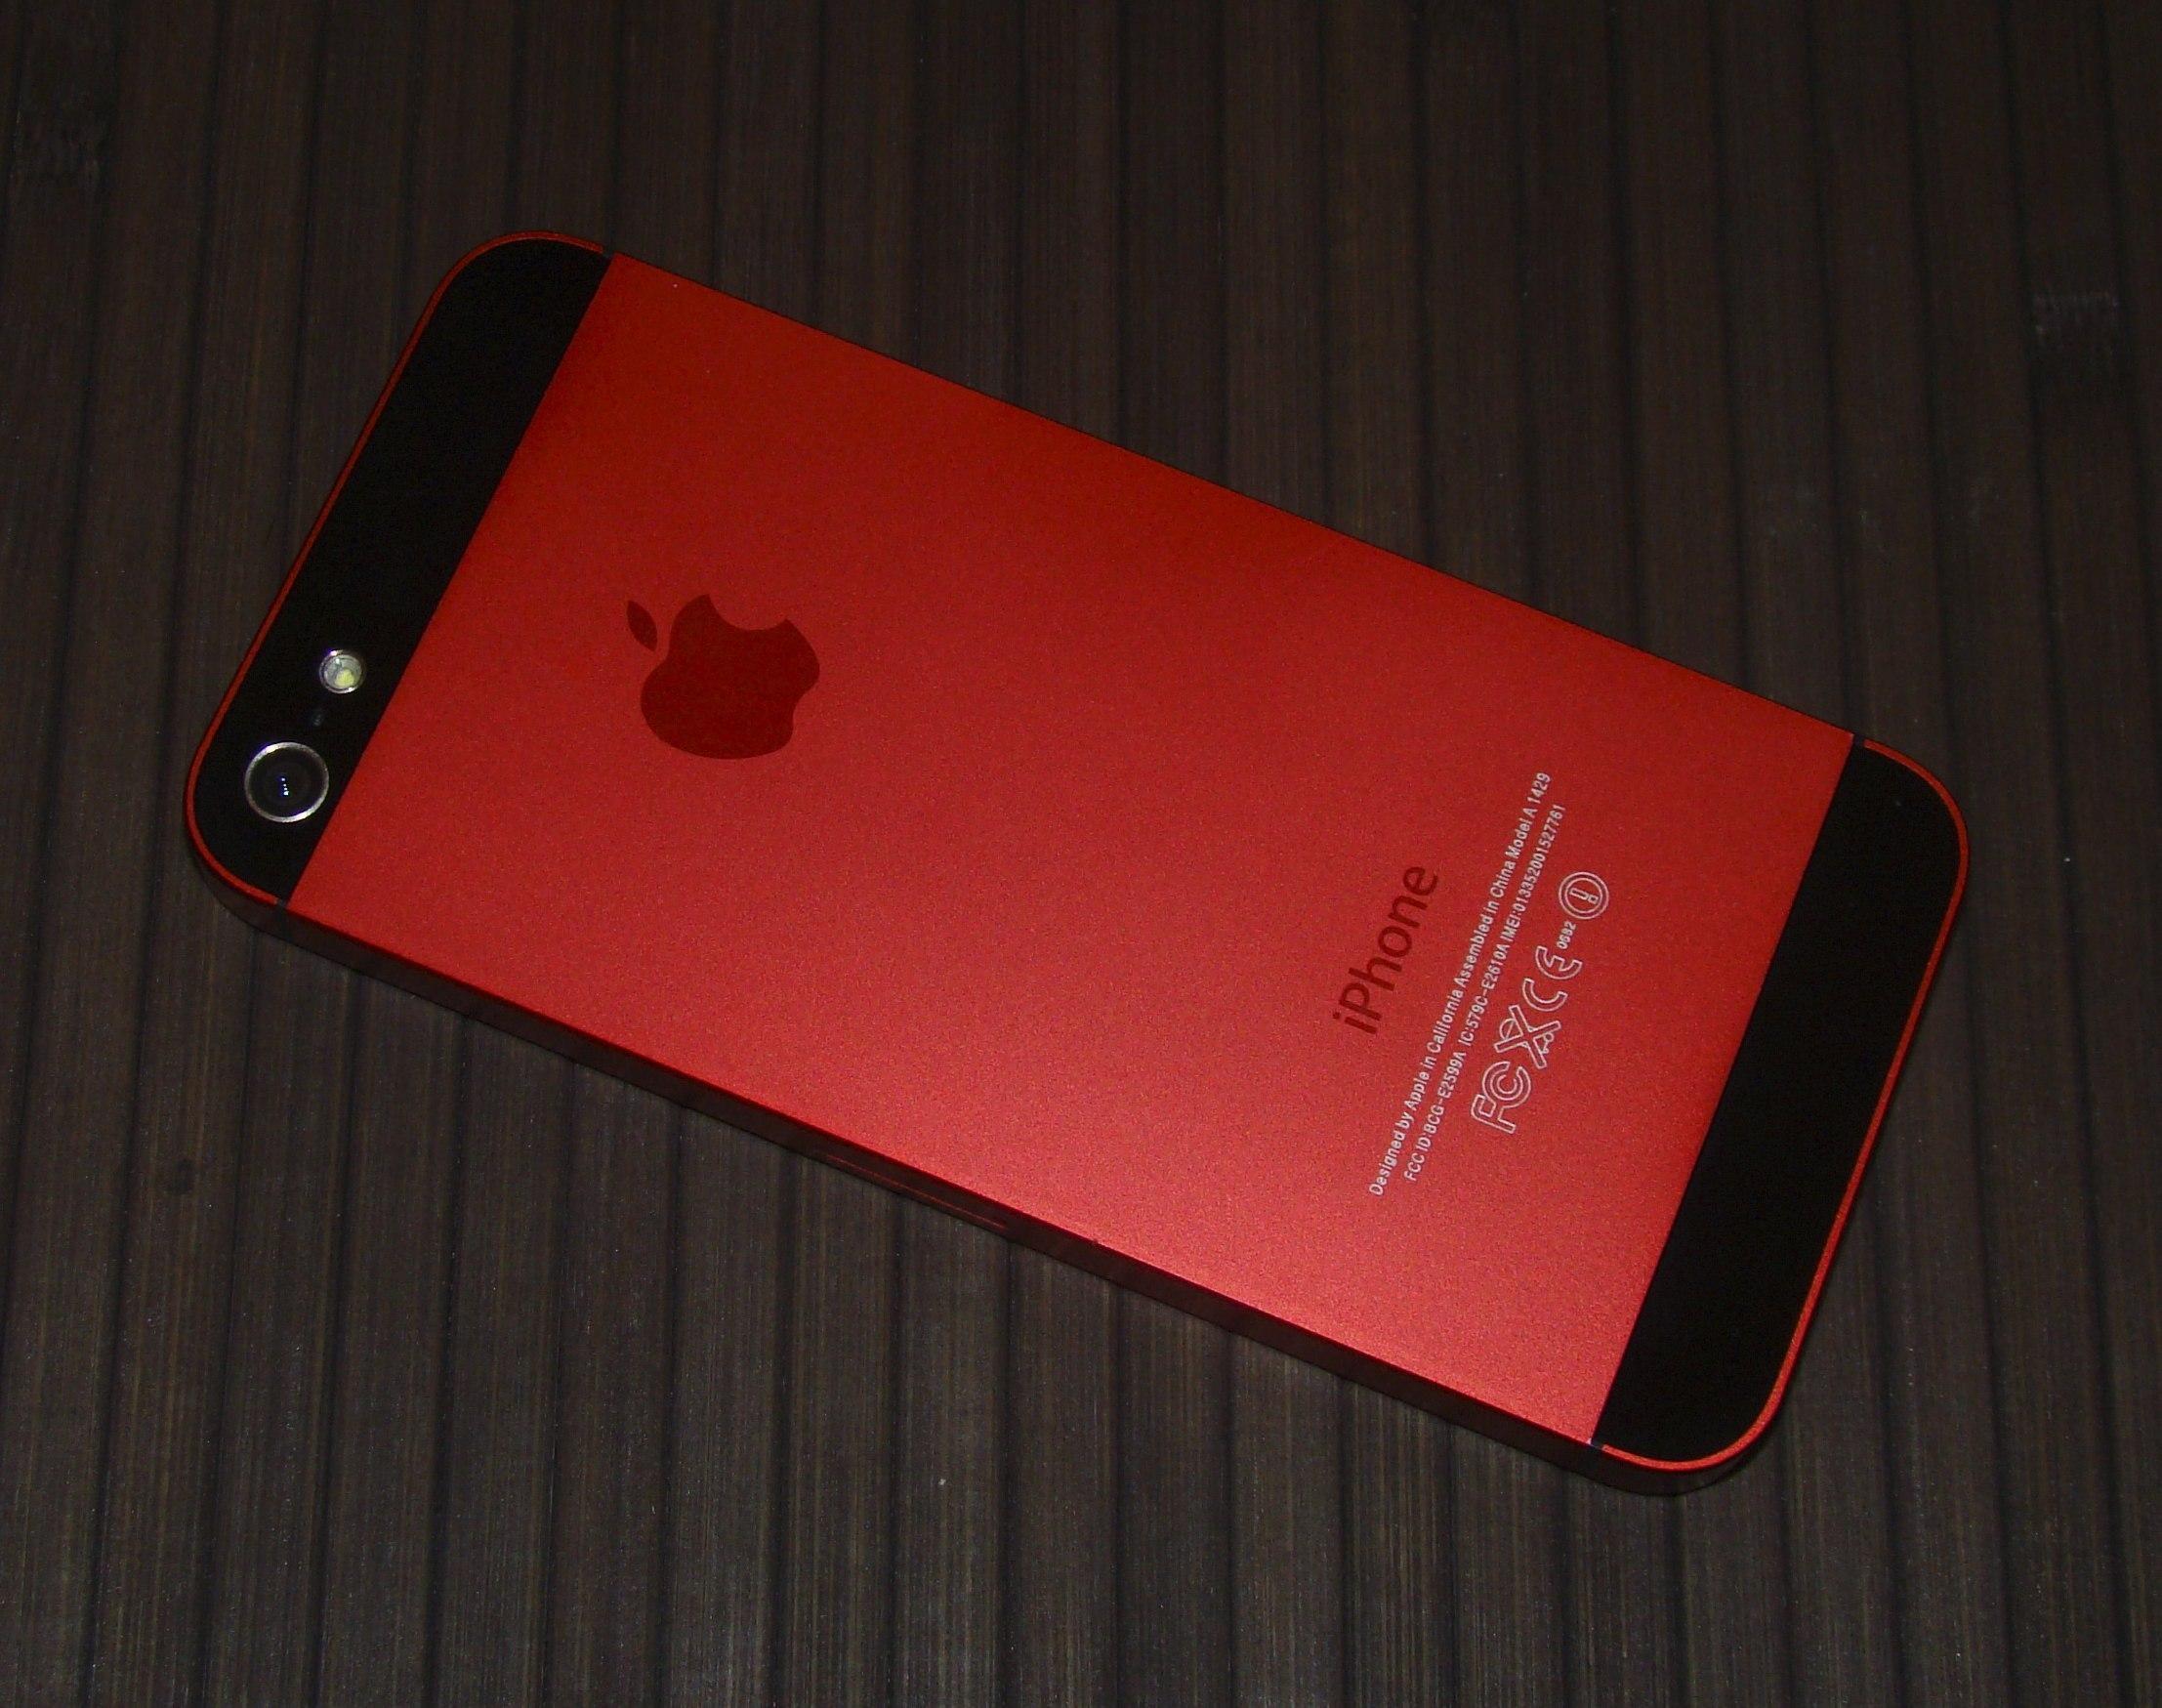 айфон красного цвета фото стрижка половина